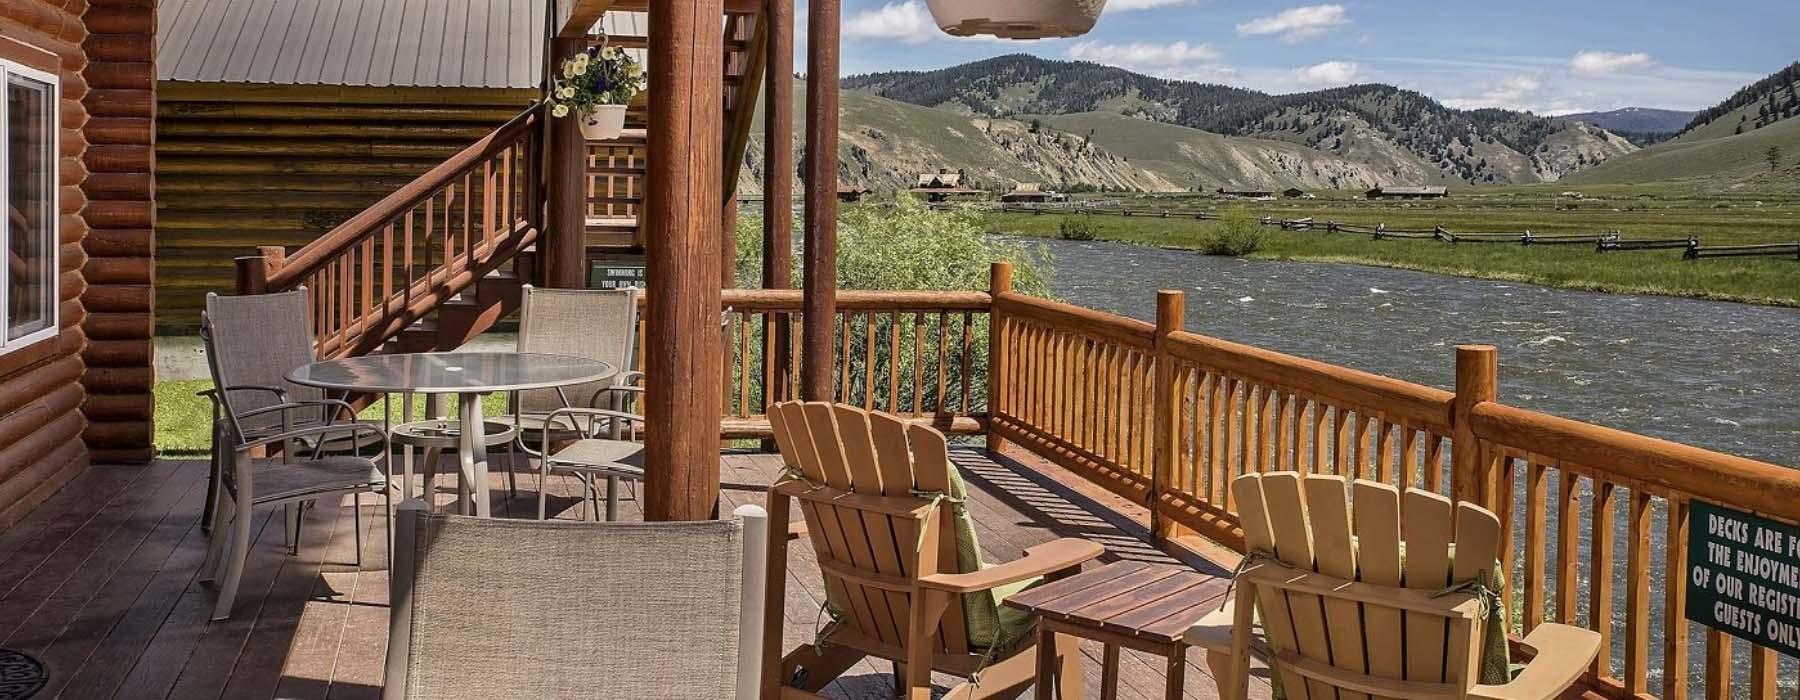 Backdeck overlooking Salmon River at Redfish Riverside Inn